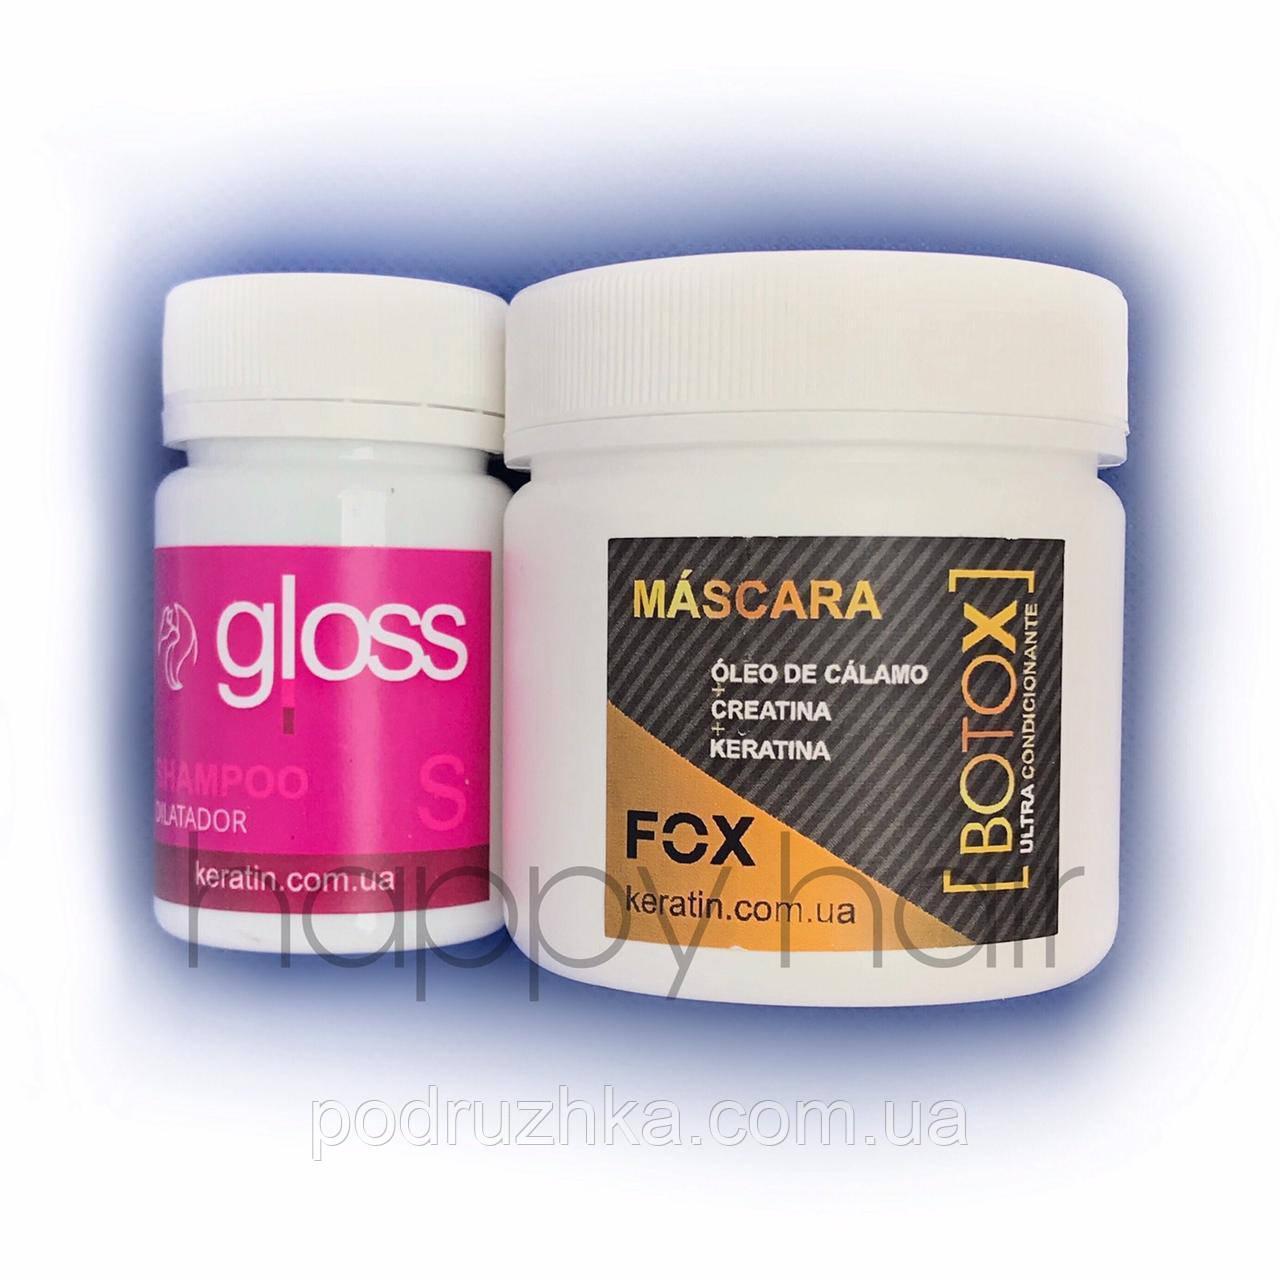 FOX btox Ultra Condicionant Набор ботекс для волос 50/100 г